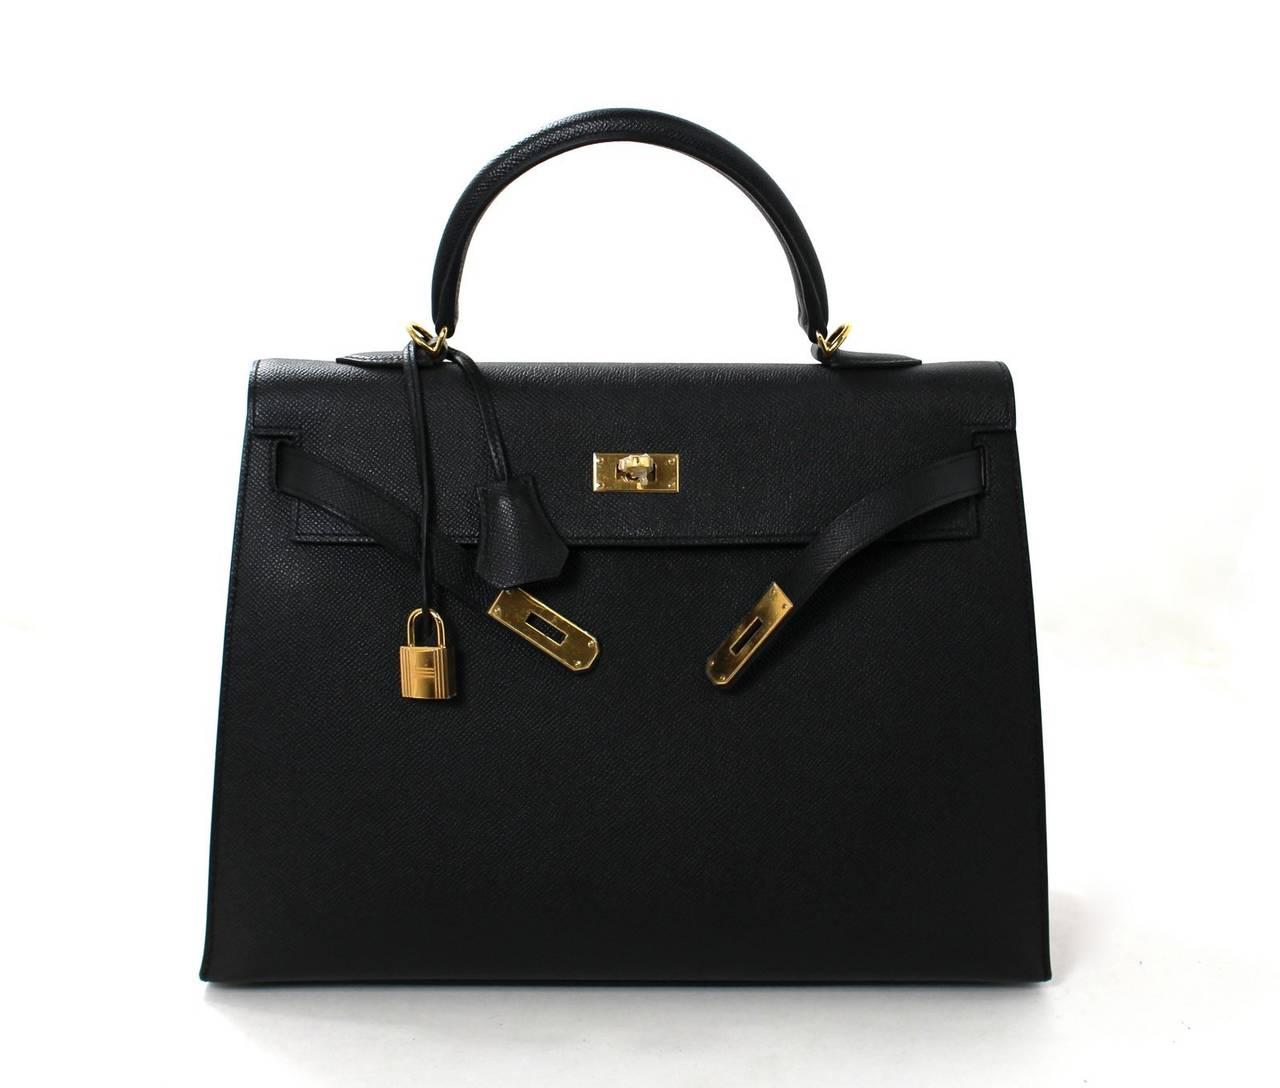 Hermes Black Kelly Sellier- Epsom Leather GHW  in 35 cm size 4